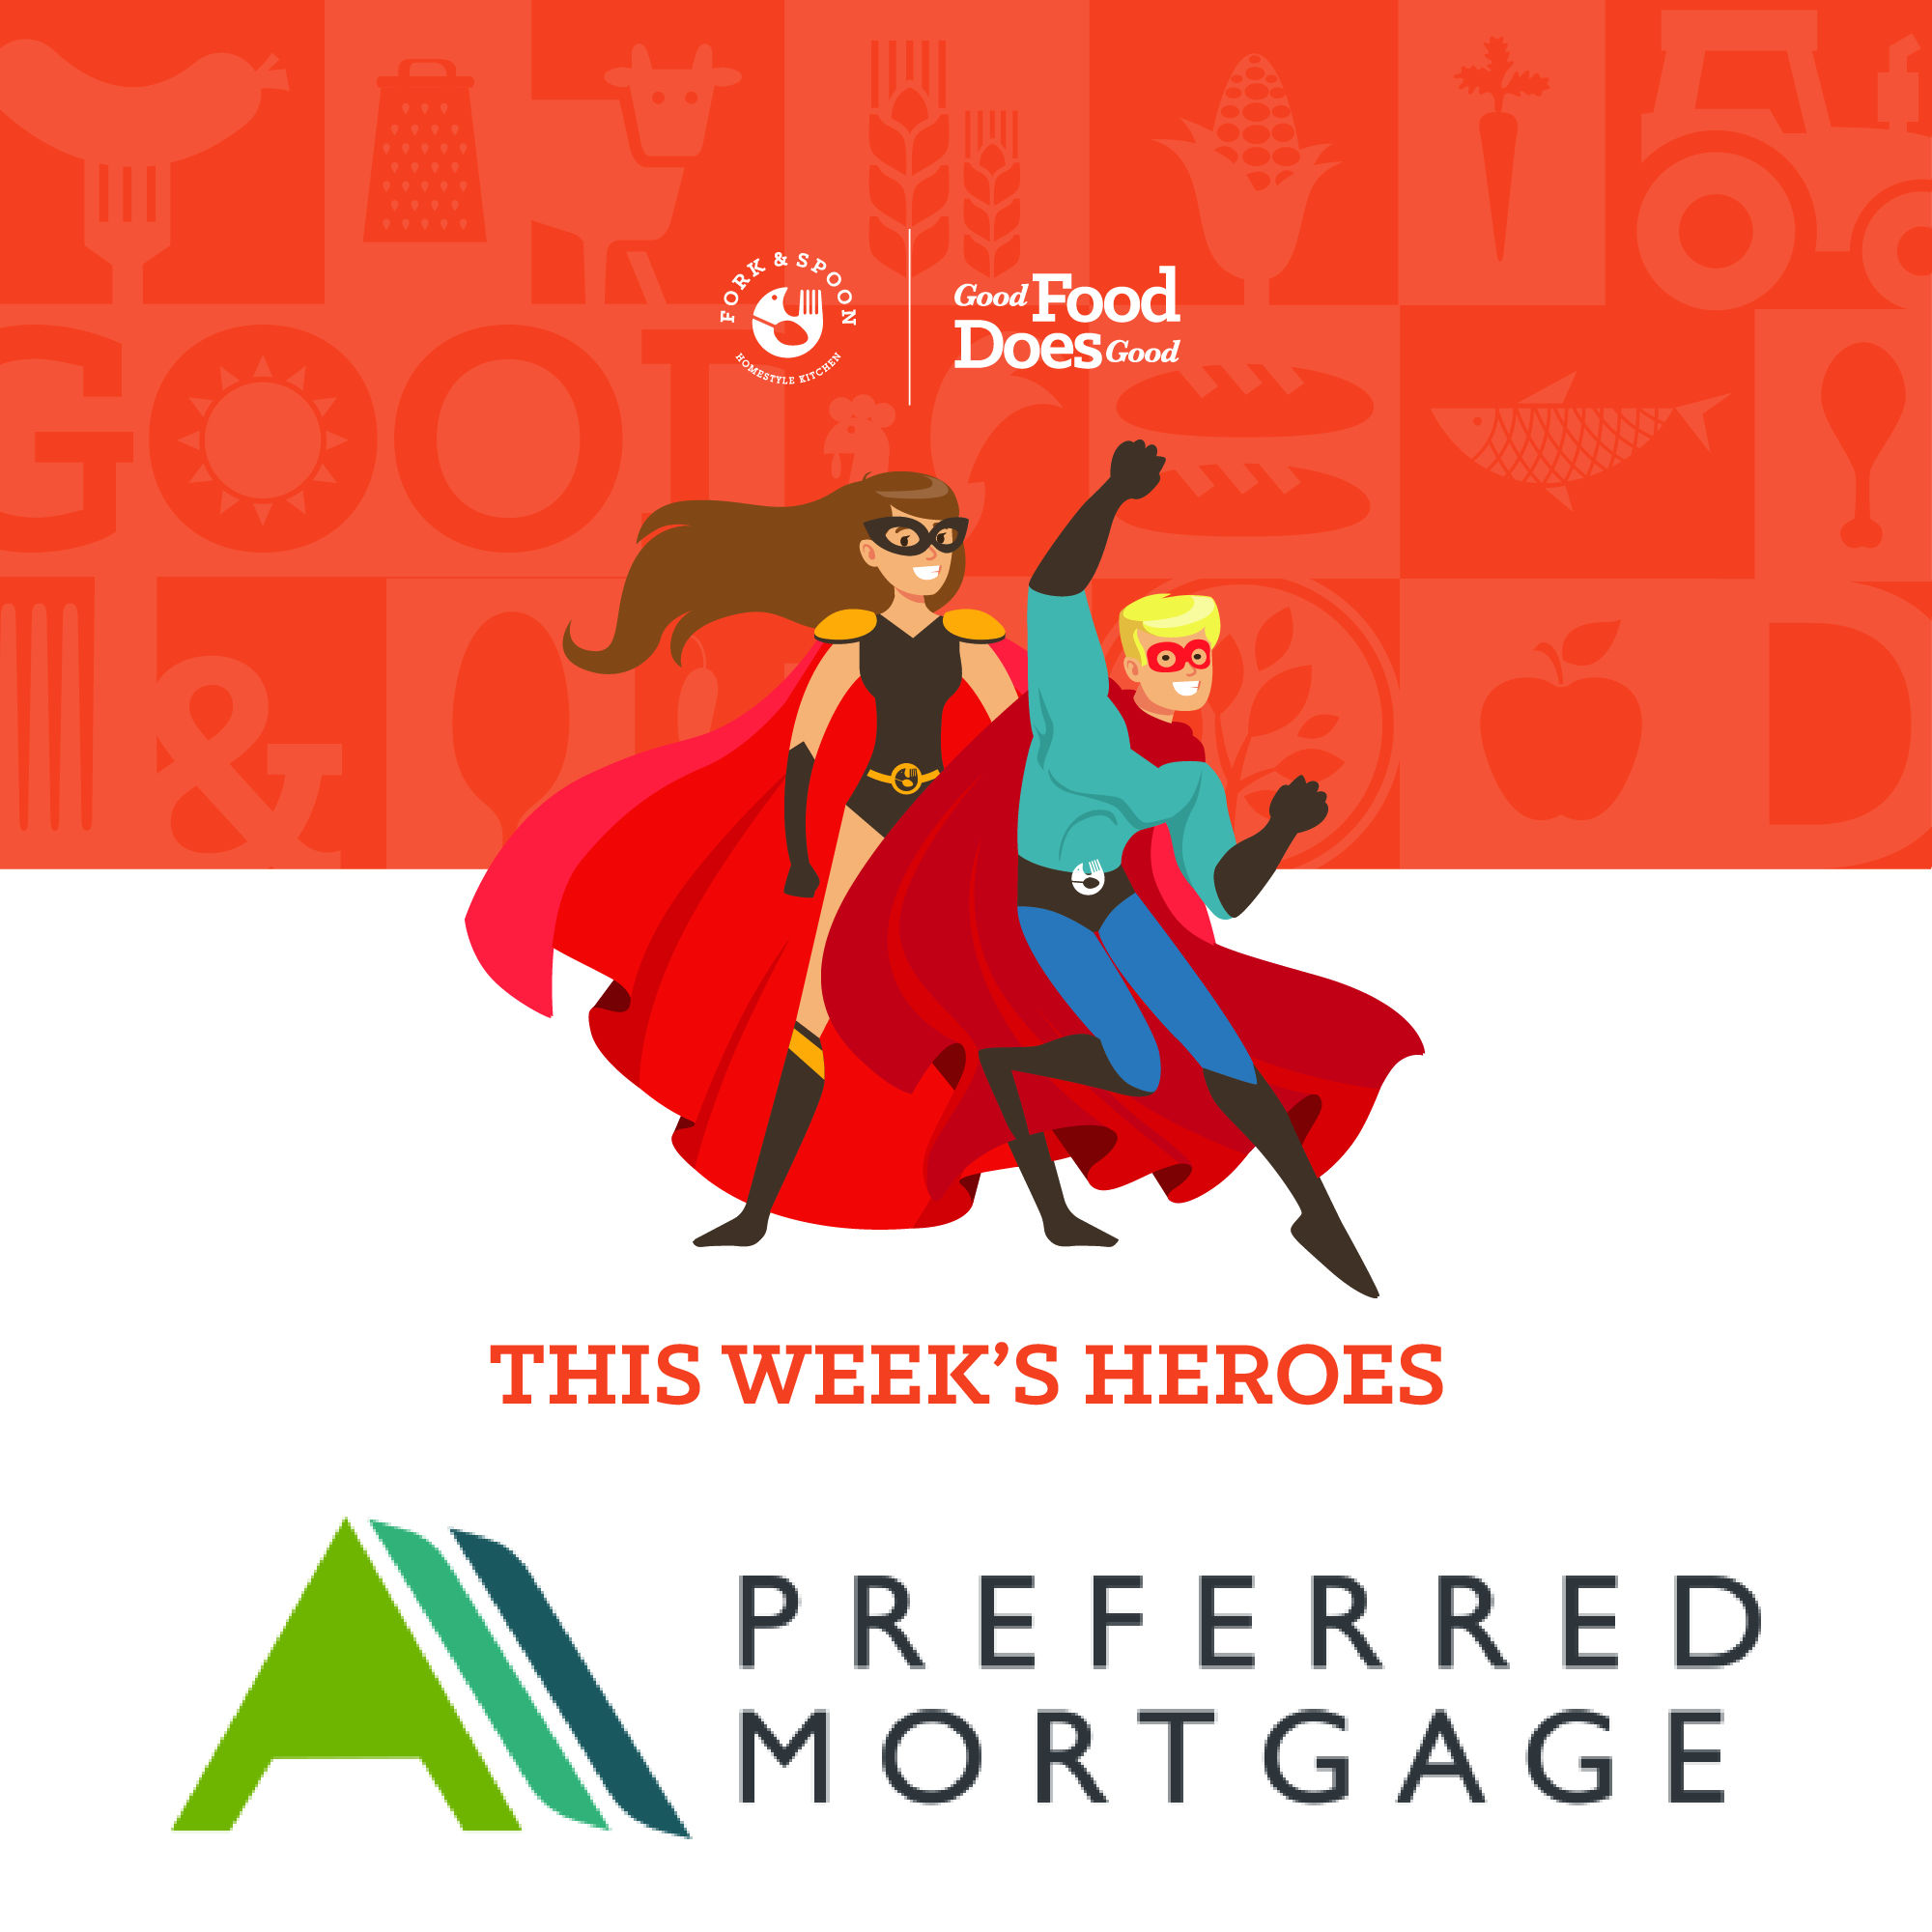 A Preferred Mortgage.jpg